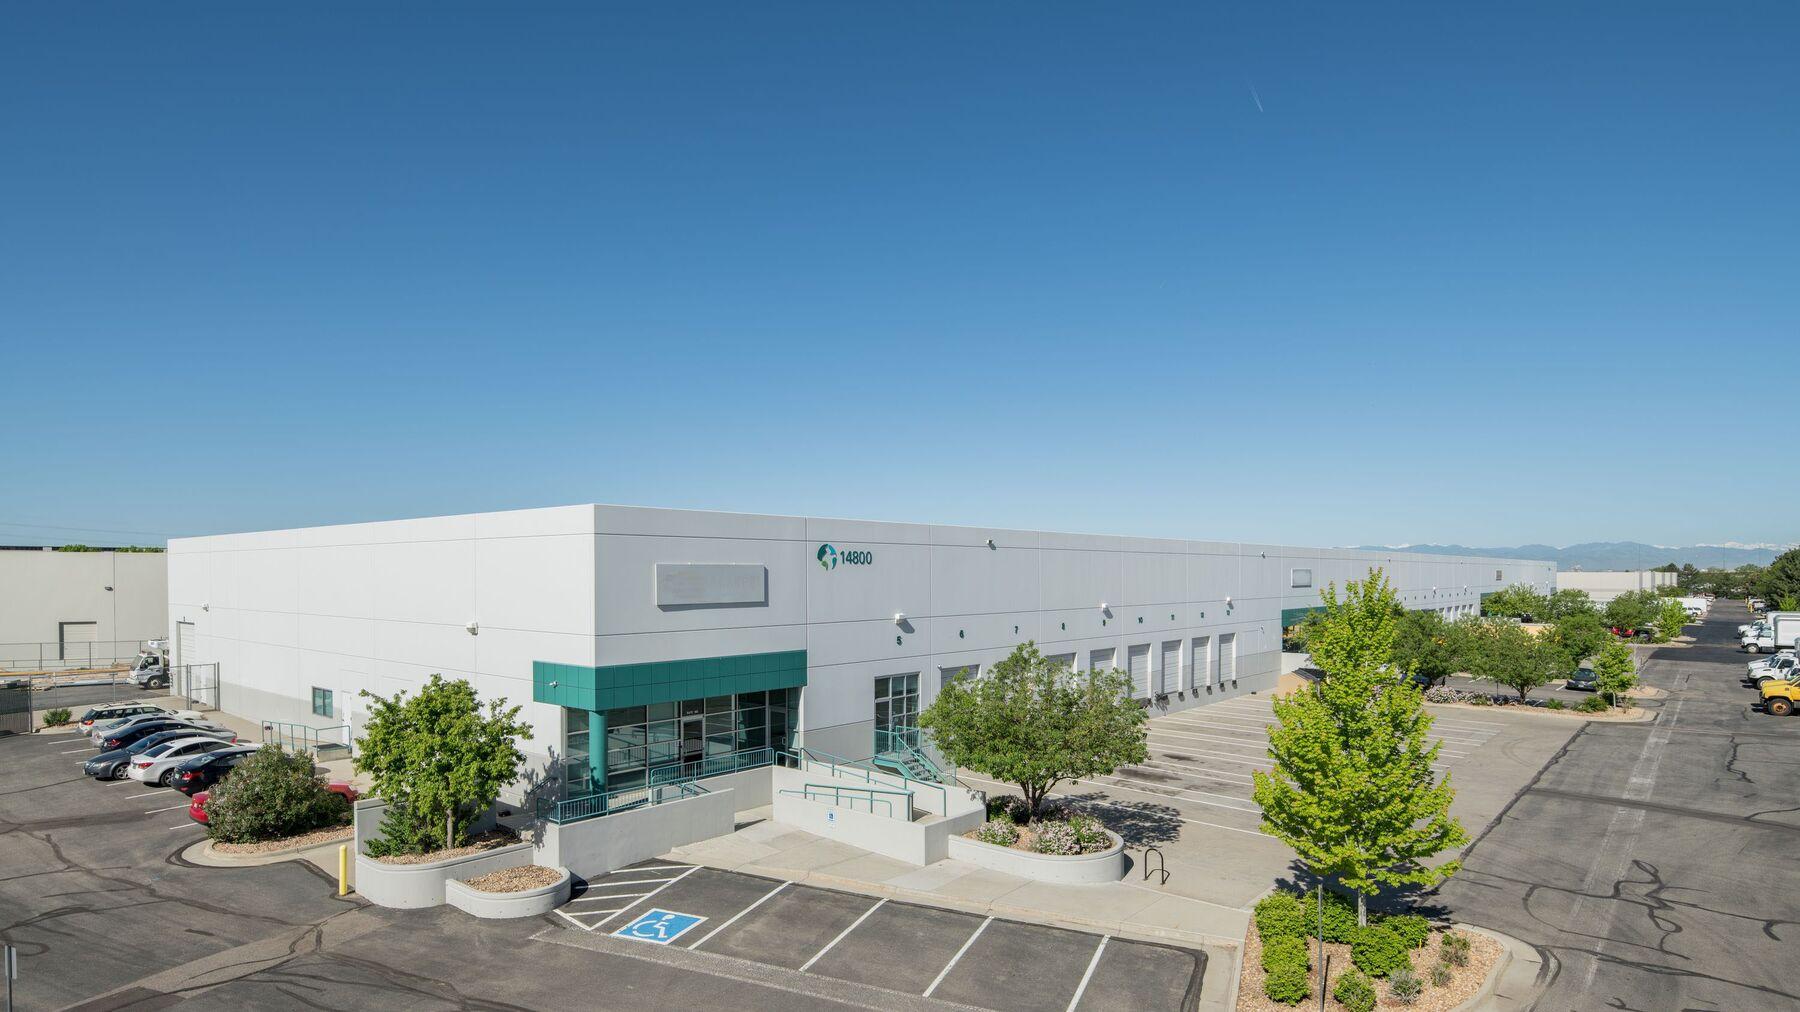 DPM-3000x2400-Denver-12-1-2021.jpg